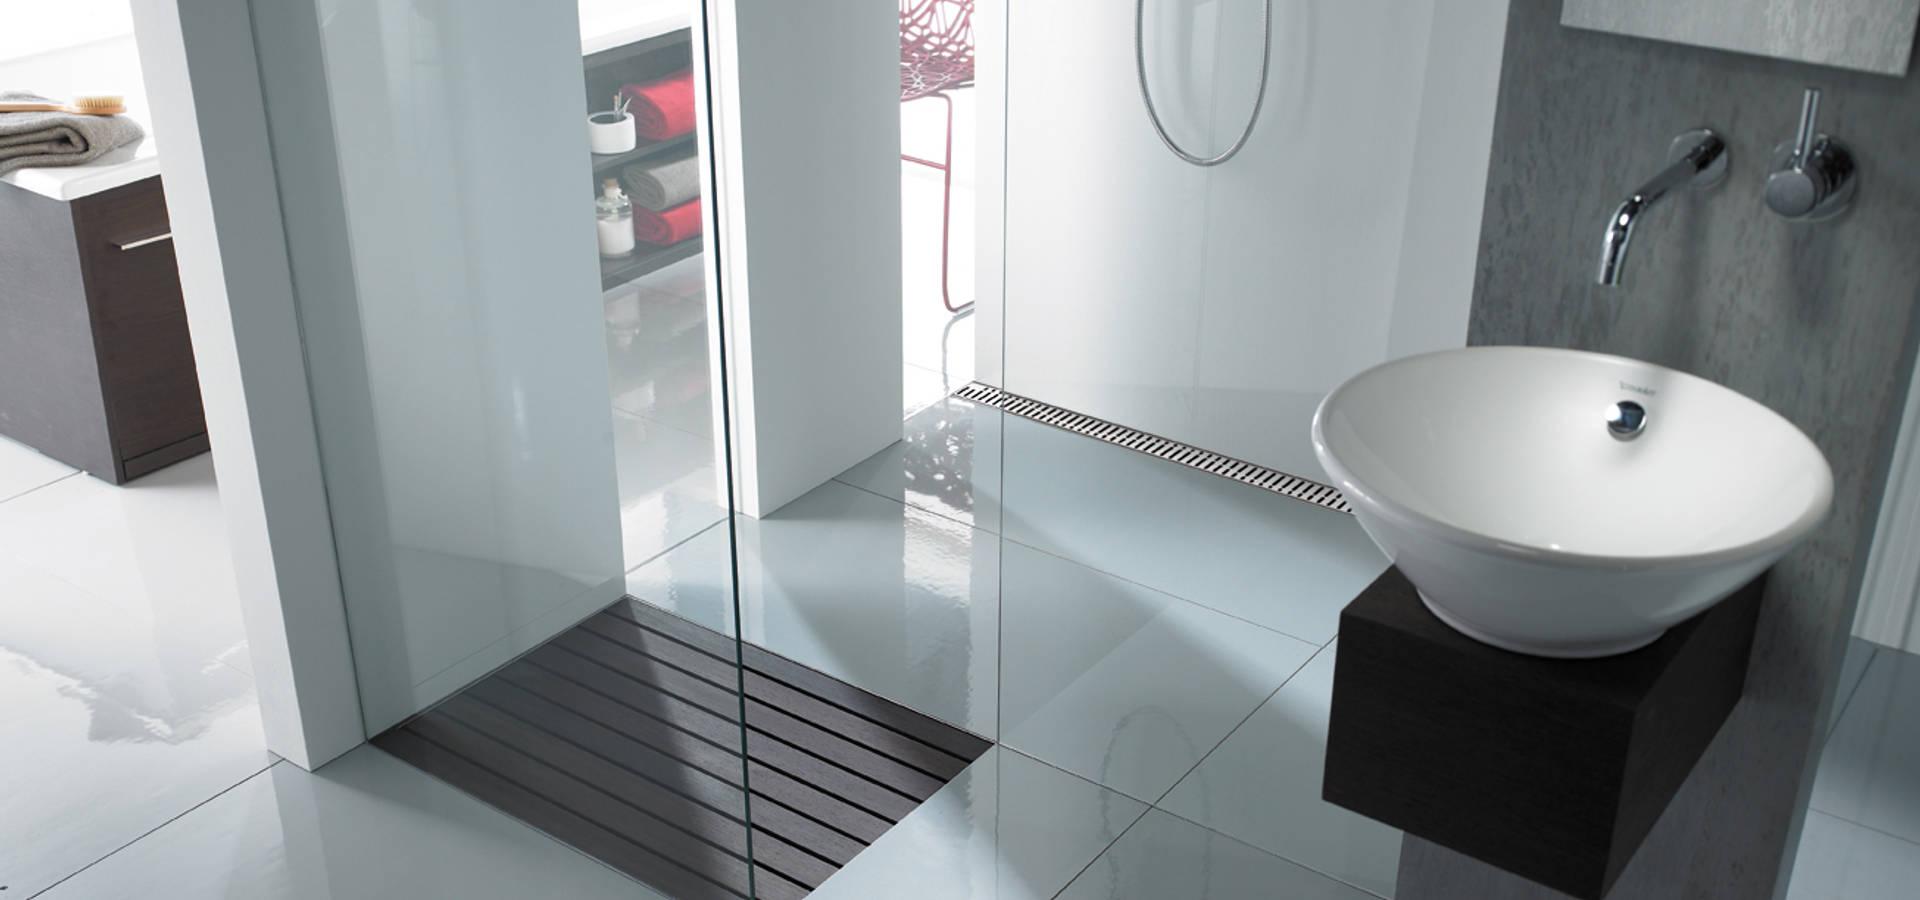 Aco bv vloeren in doetinchem homify - Integrale badkamer ...